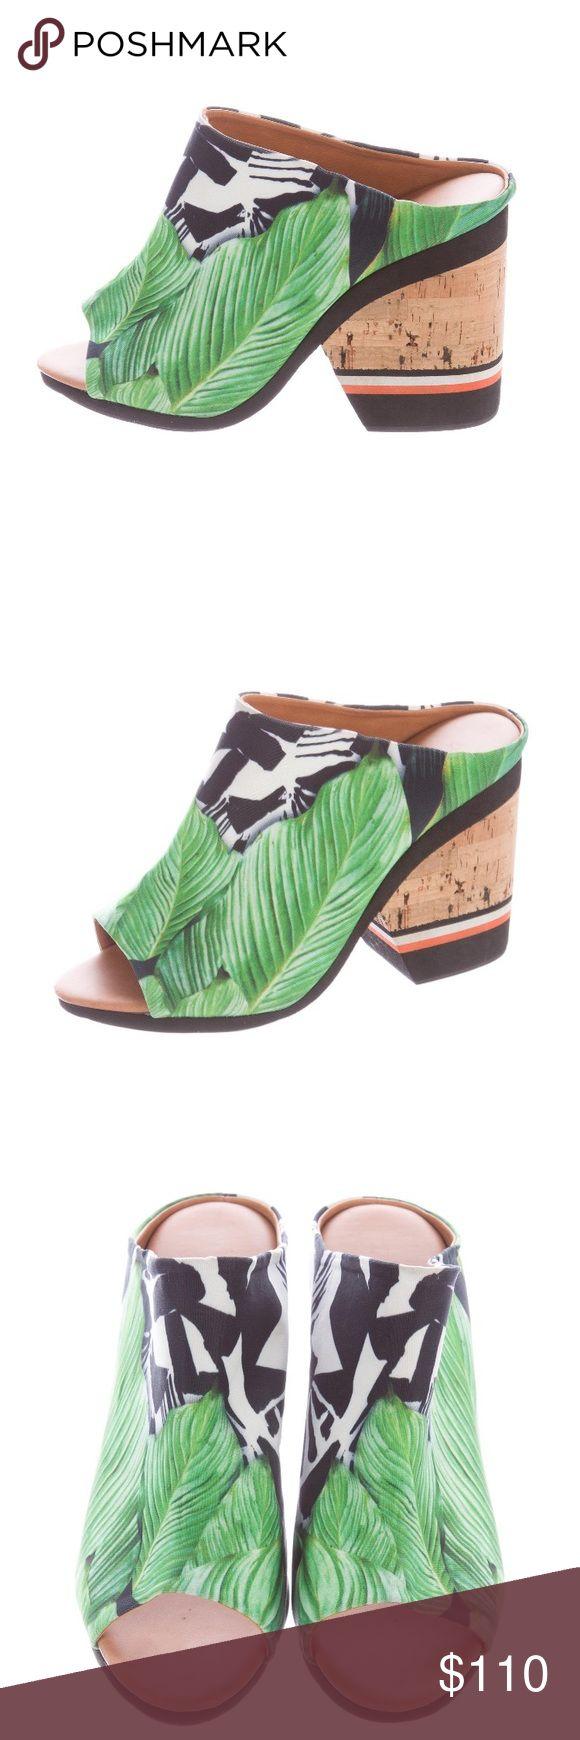 Clover Canyon Natures Divide Slide Sandals Clover Canyon Natures Divide Slide Sandals • Never worn • Make an offer! Clover Canyon Shoes Sandals